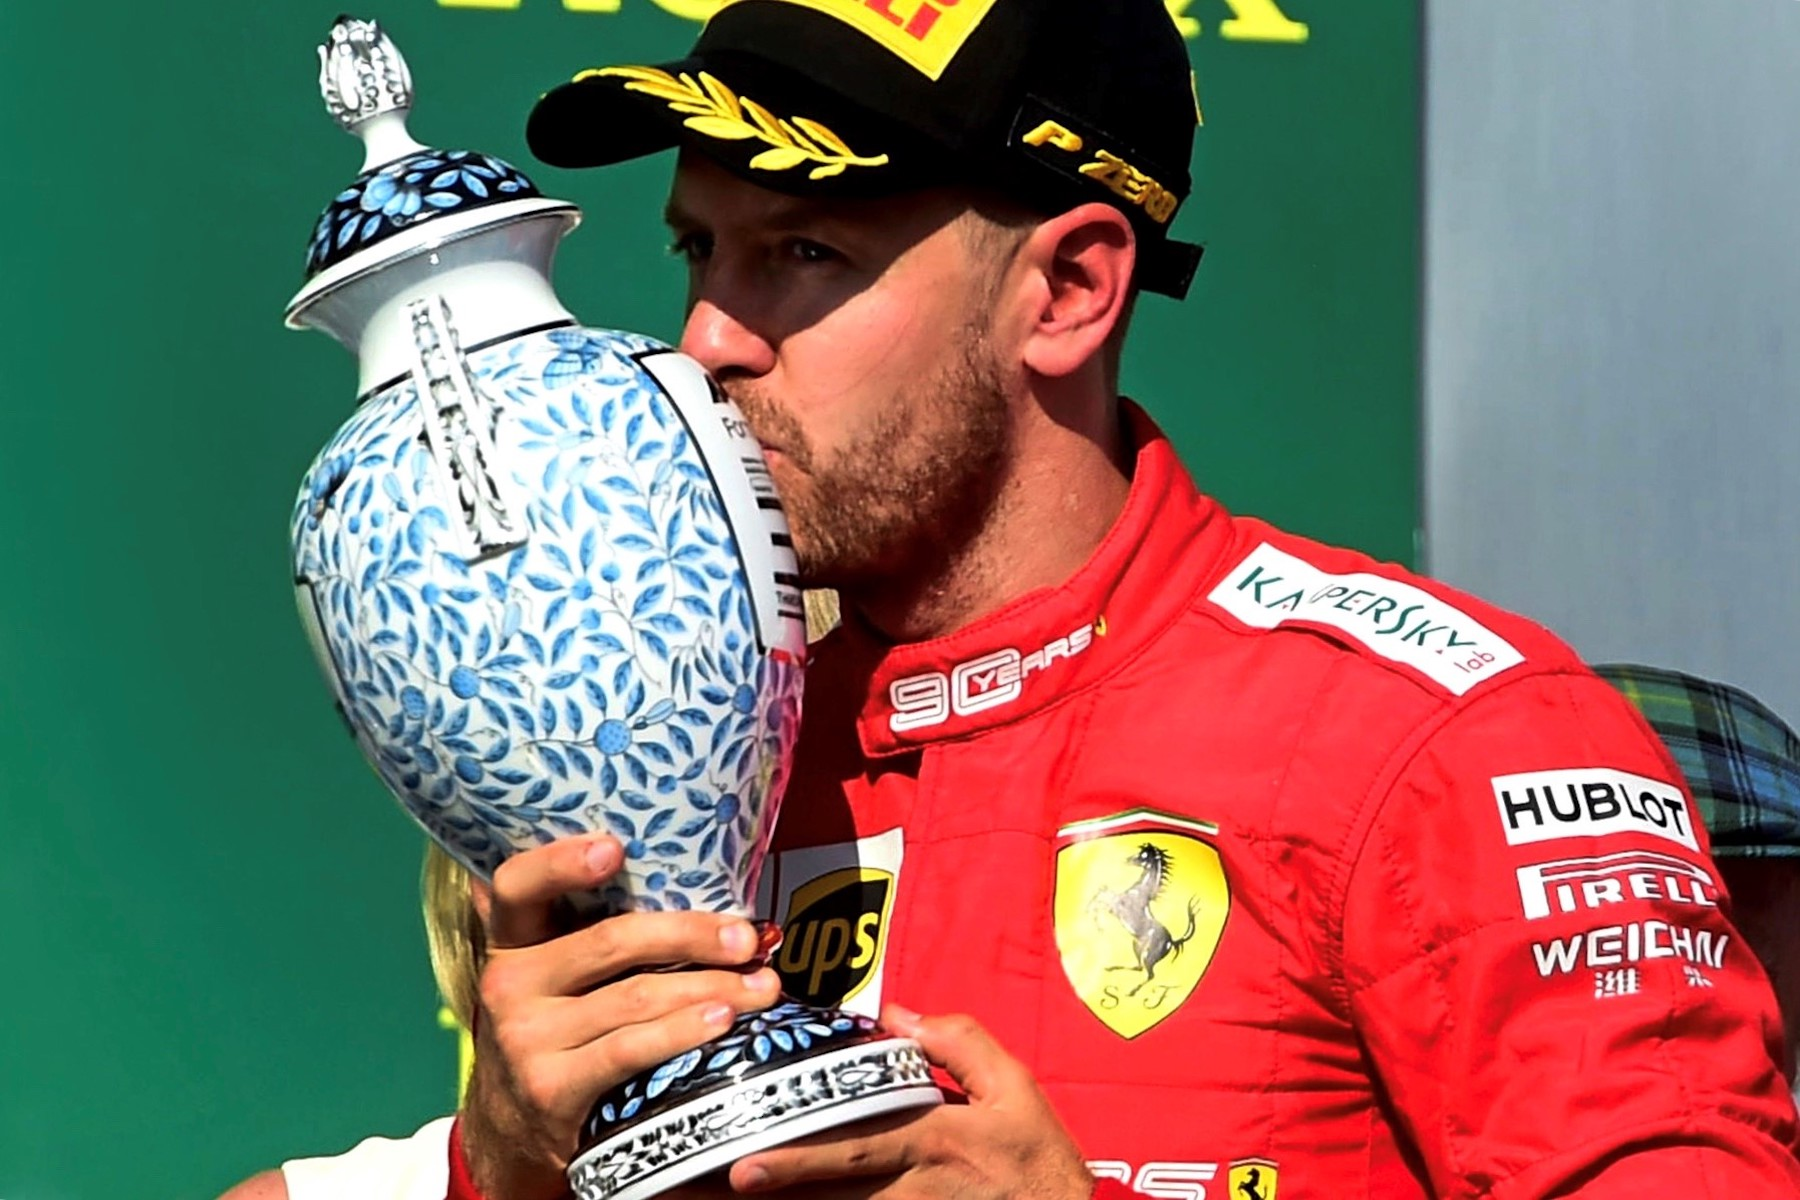 6 2019 Hungarian GP Sunday 81.jpg